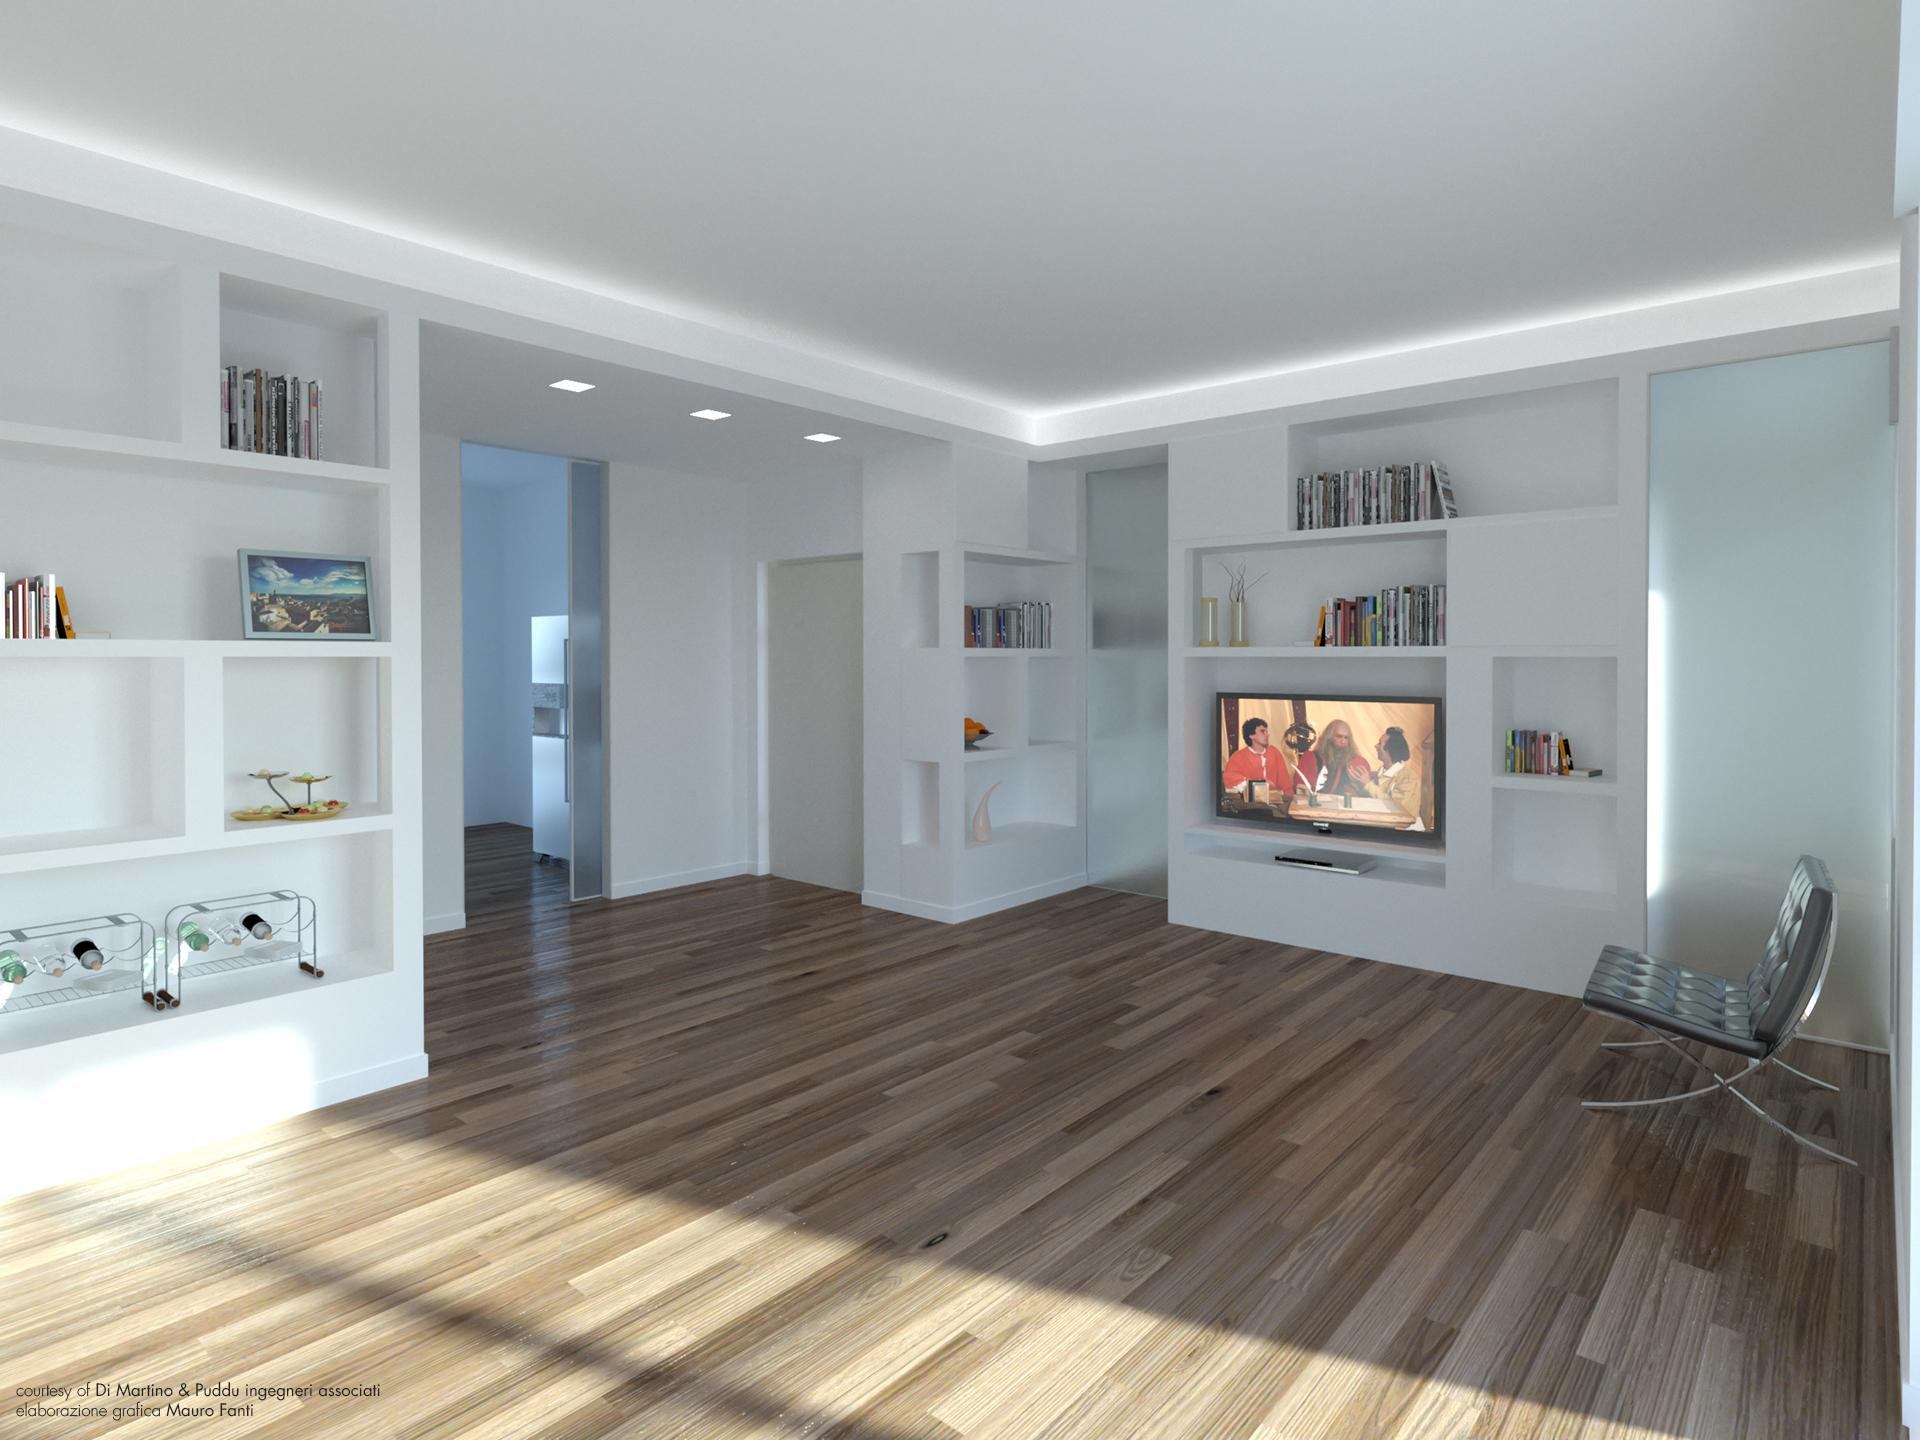 Architettura d 39 interni mauro fanti for Interni architettura